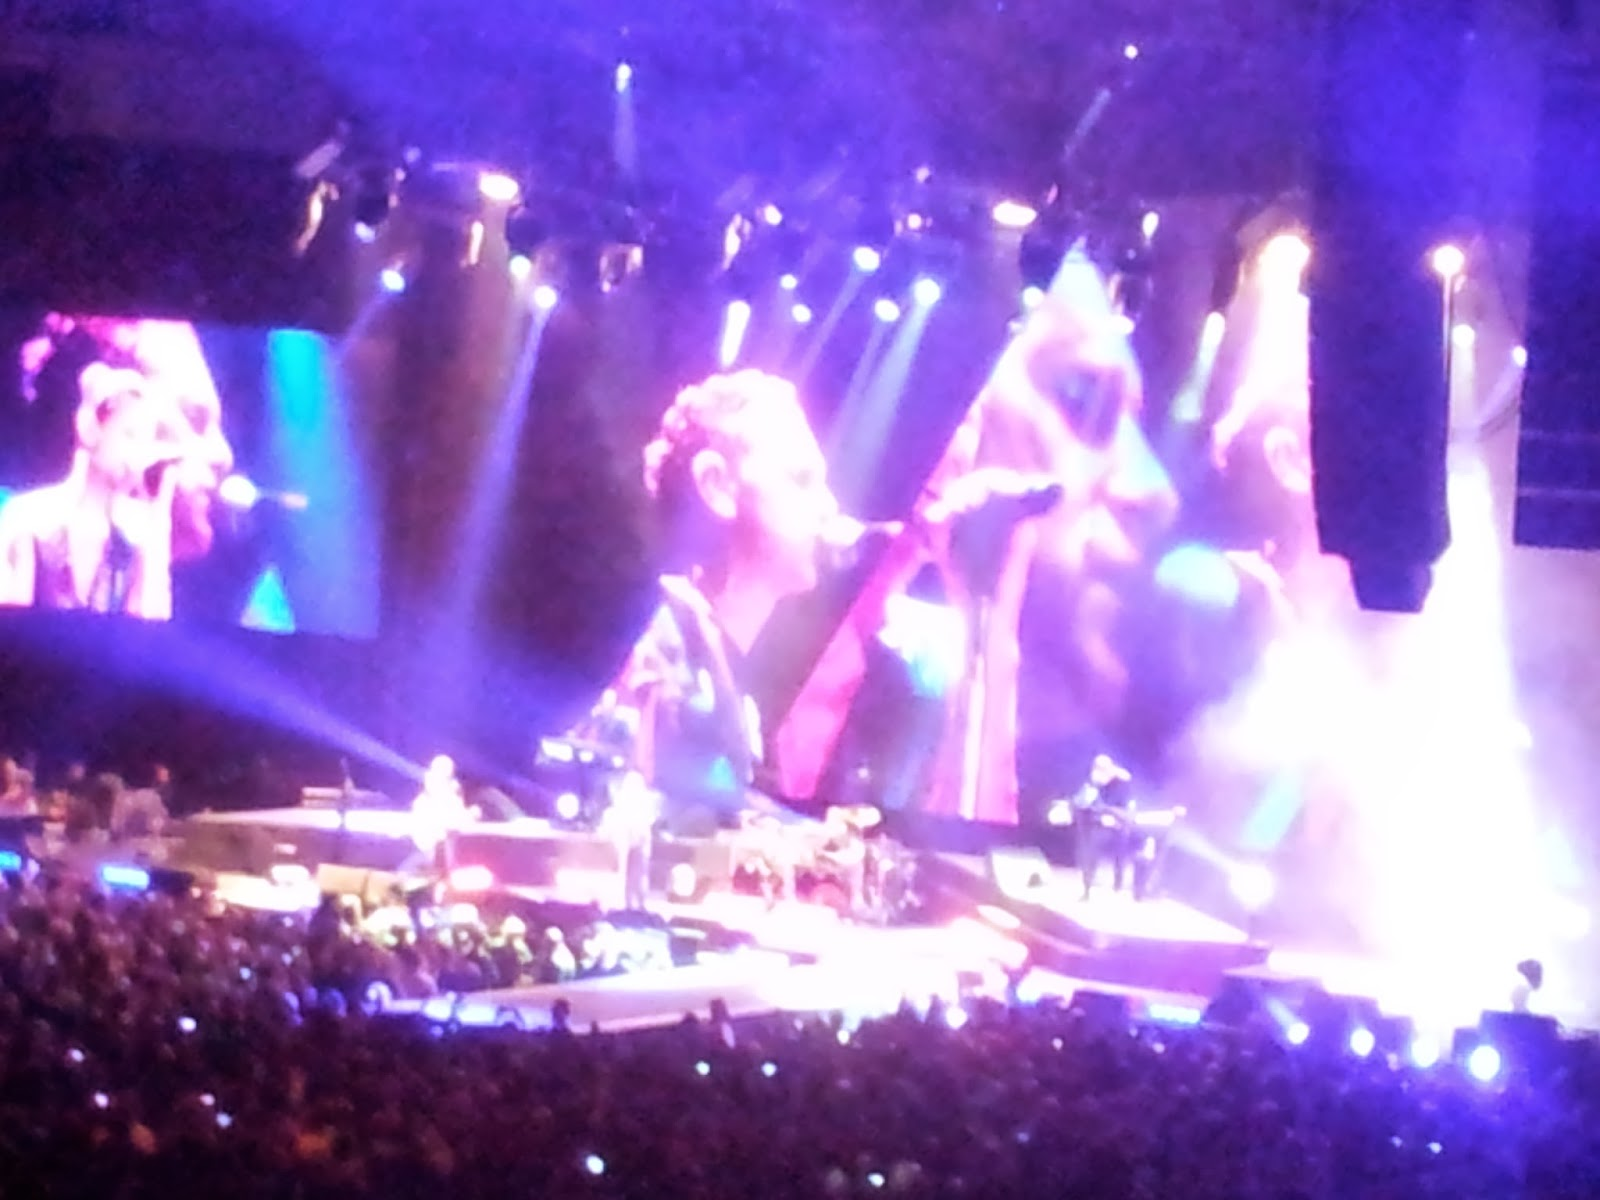 Martin Gore singing in a Depeche Mode concert